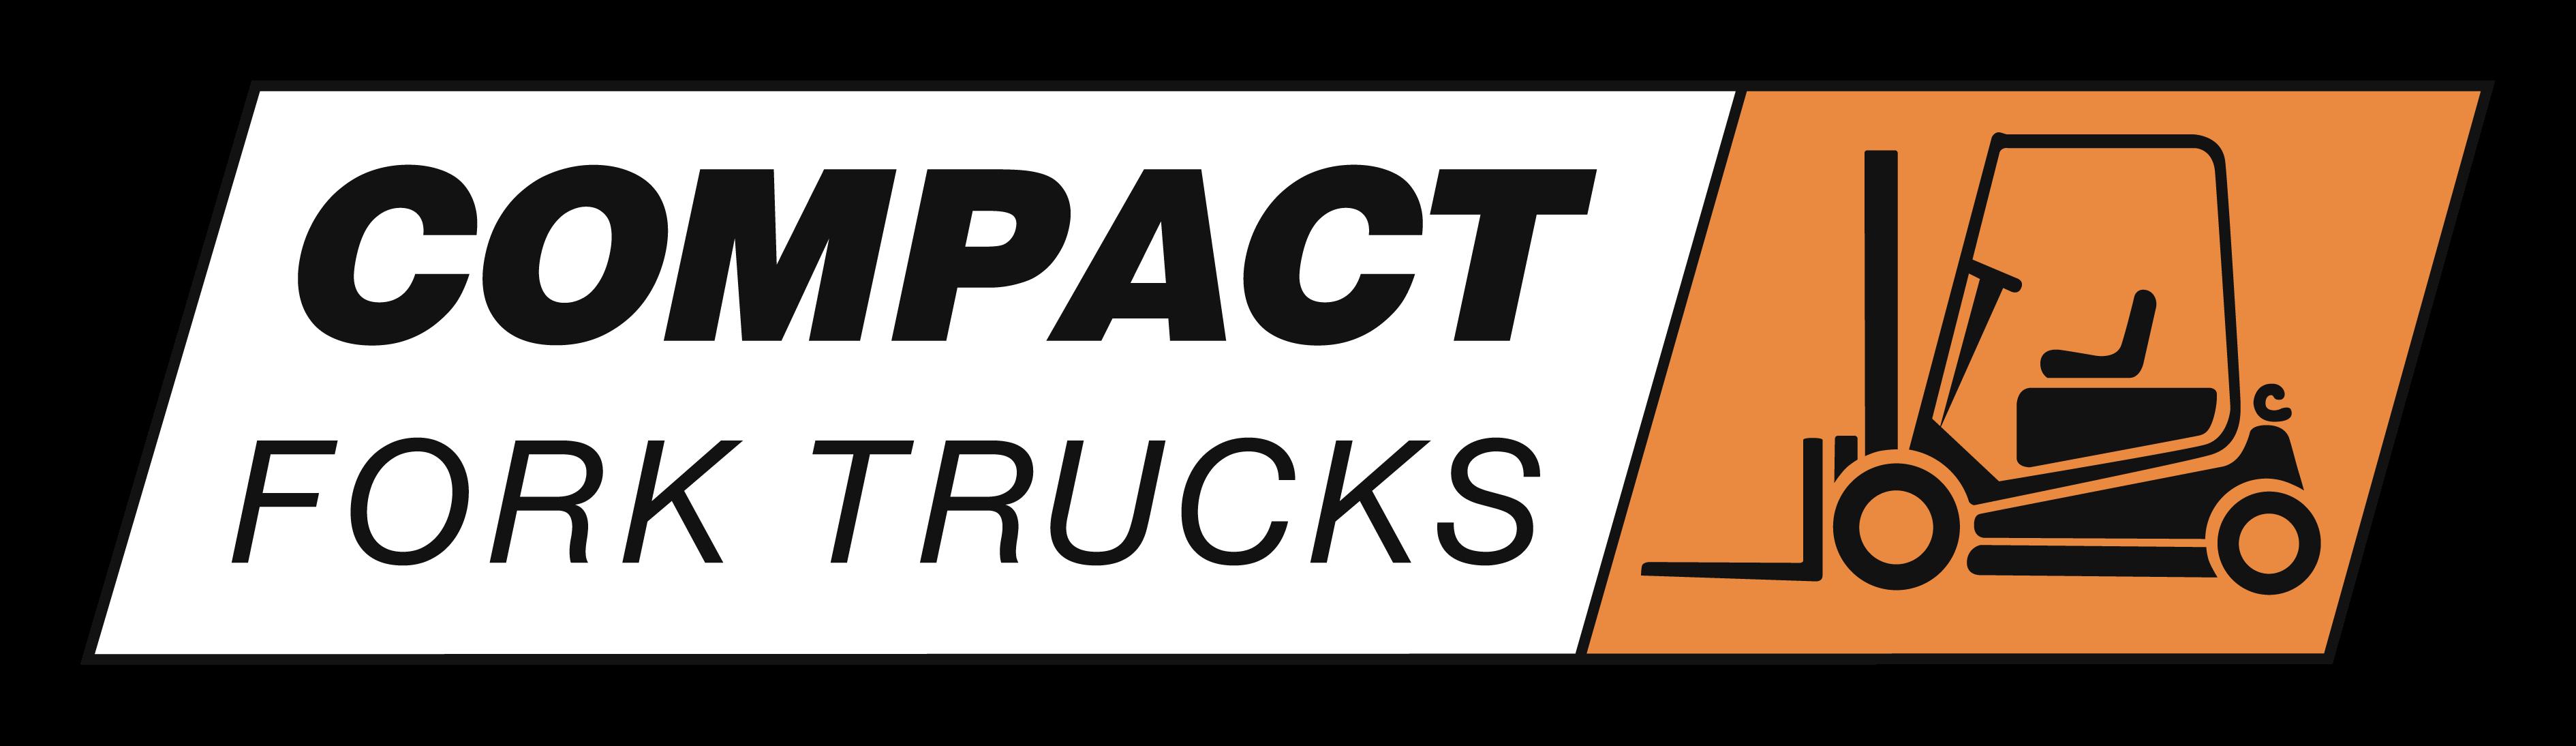 Compact Fork Truck logo vector (No boarder)-1